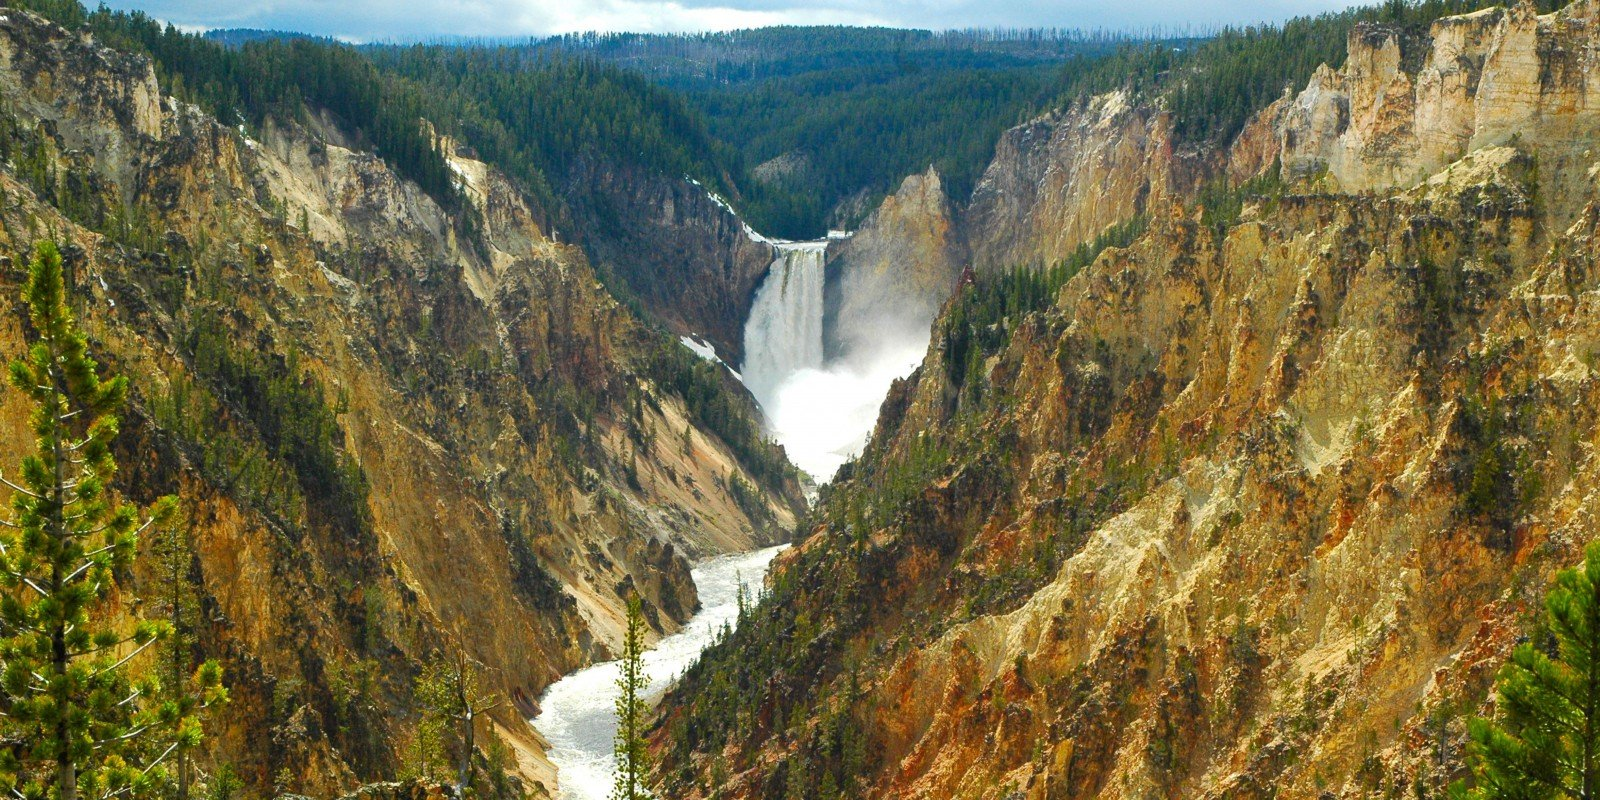 Upper Falls of Yellowstone